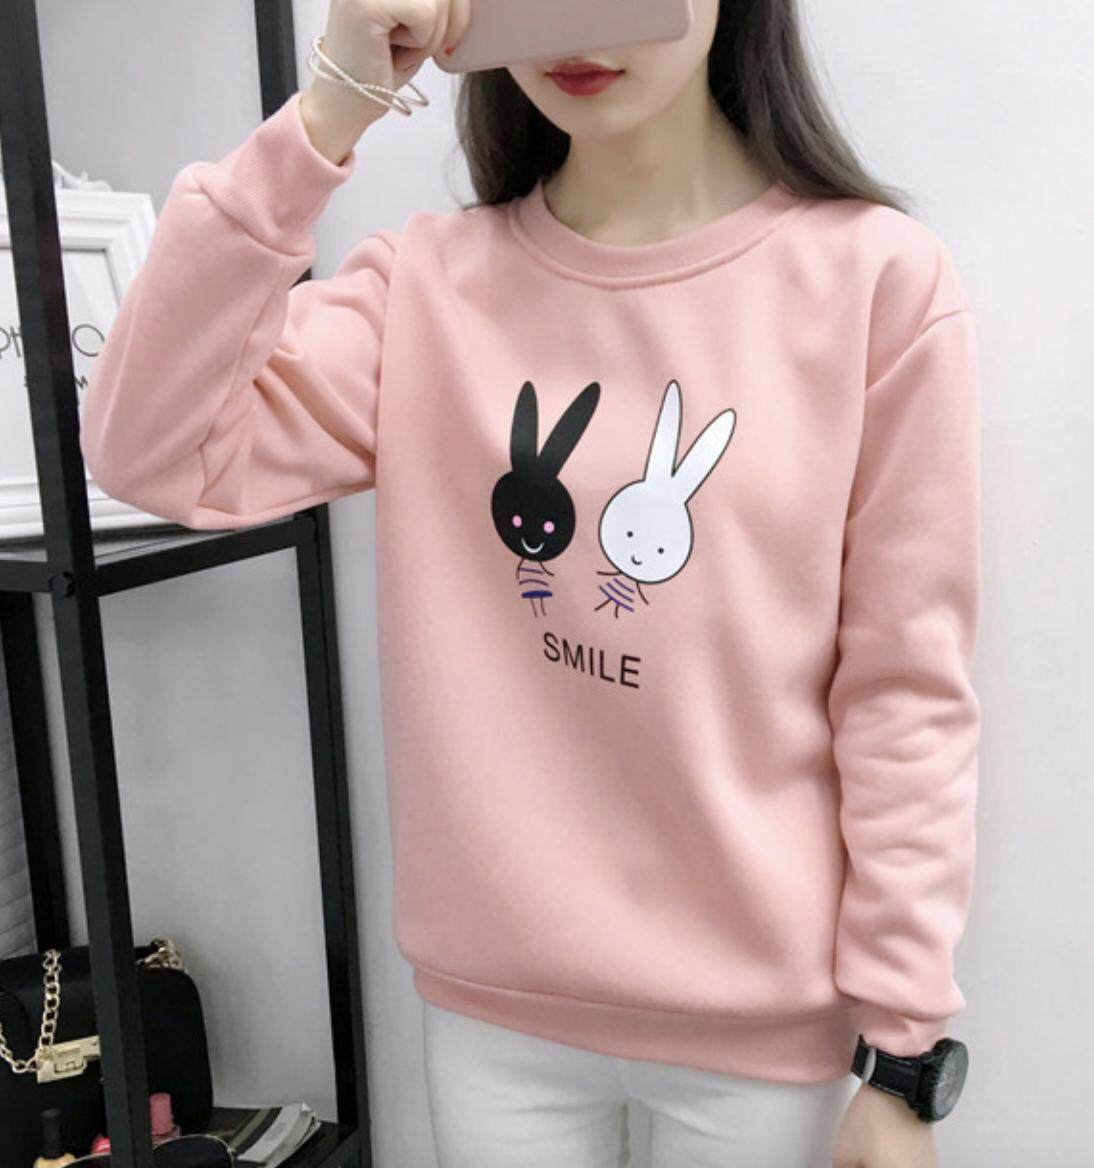 Super Fashion Korea เสื้อกันหนาว เสื้อคลุม แขนยาว ผ้าเนื้อหนา ลาย กระต่าย Smile น่ารักเว่อร์ By Super Fashion Shop.